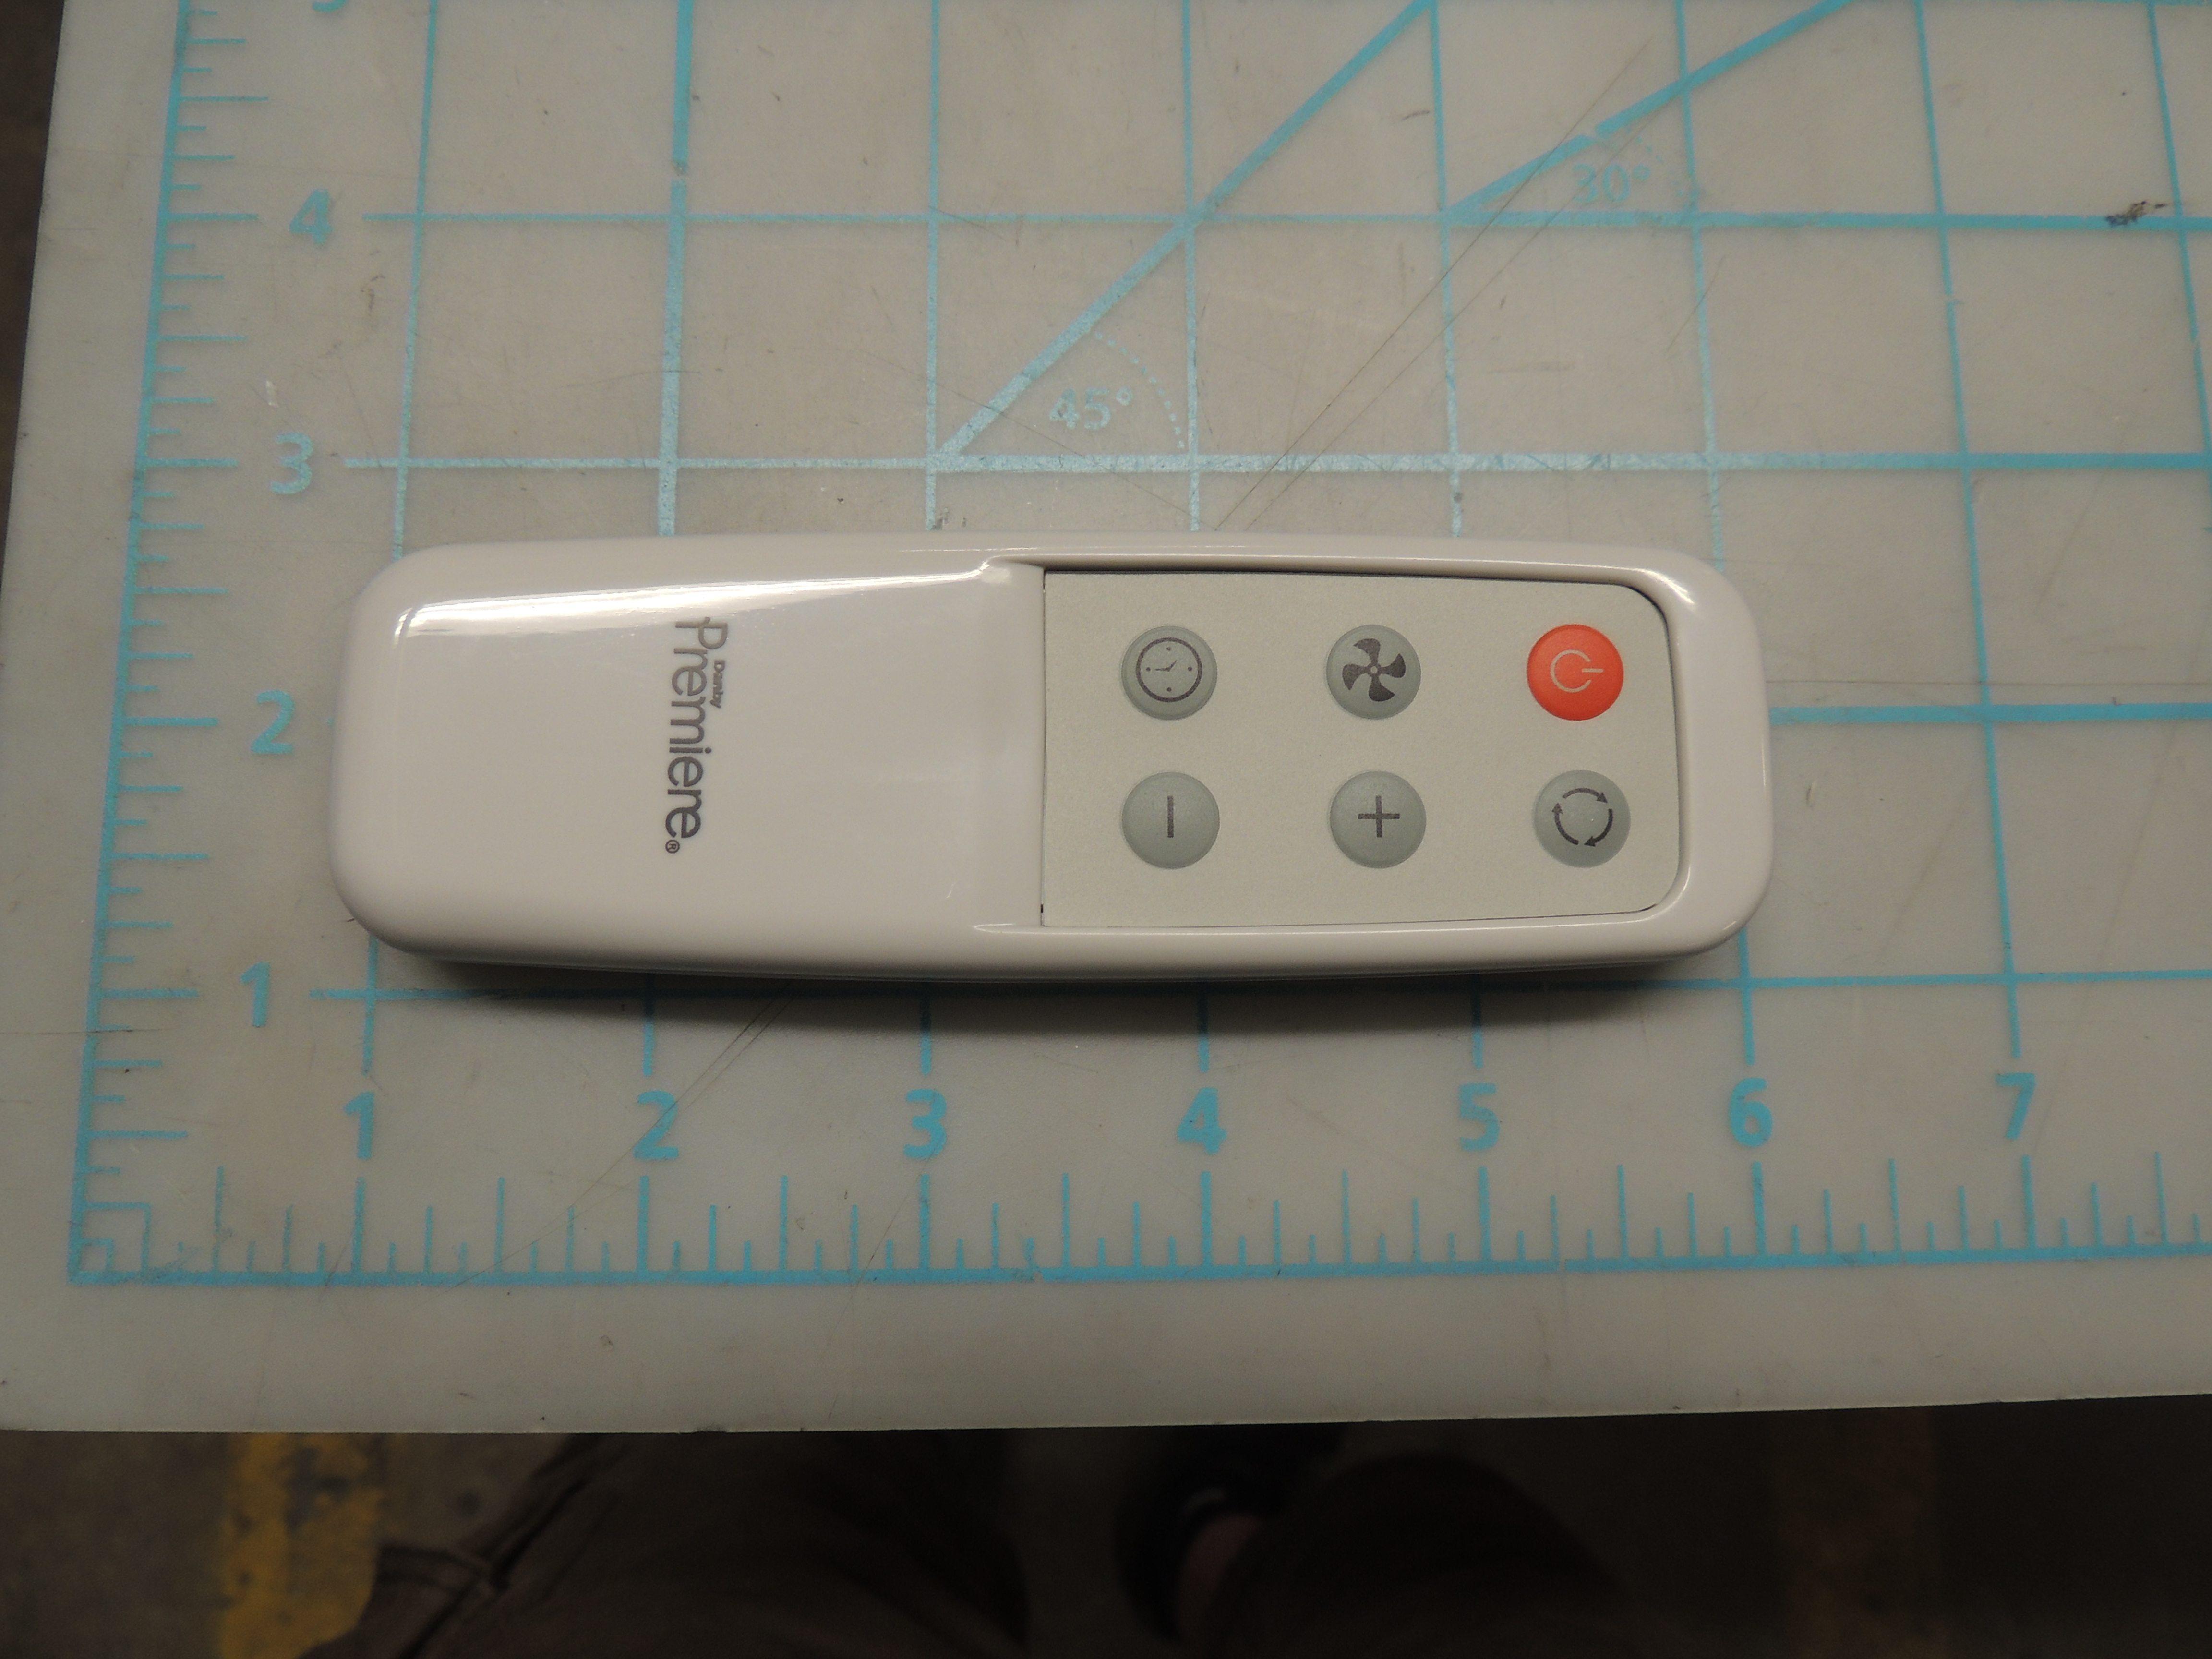 DPAC9009 REMOTE